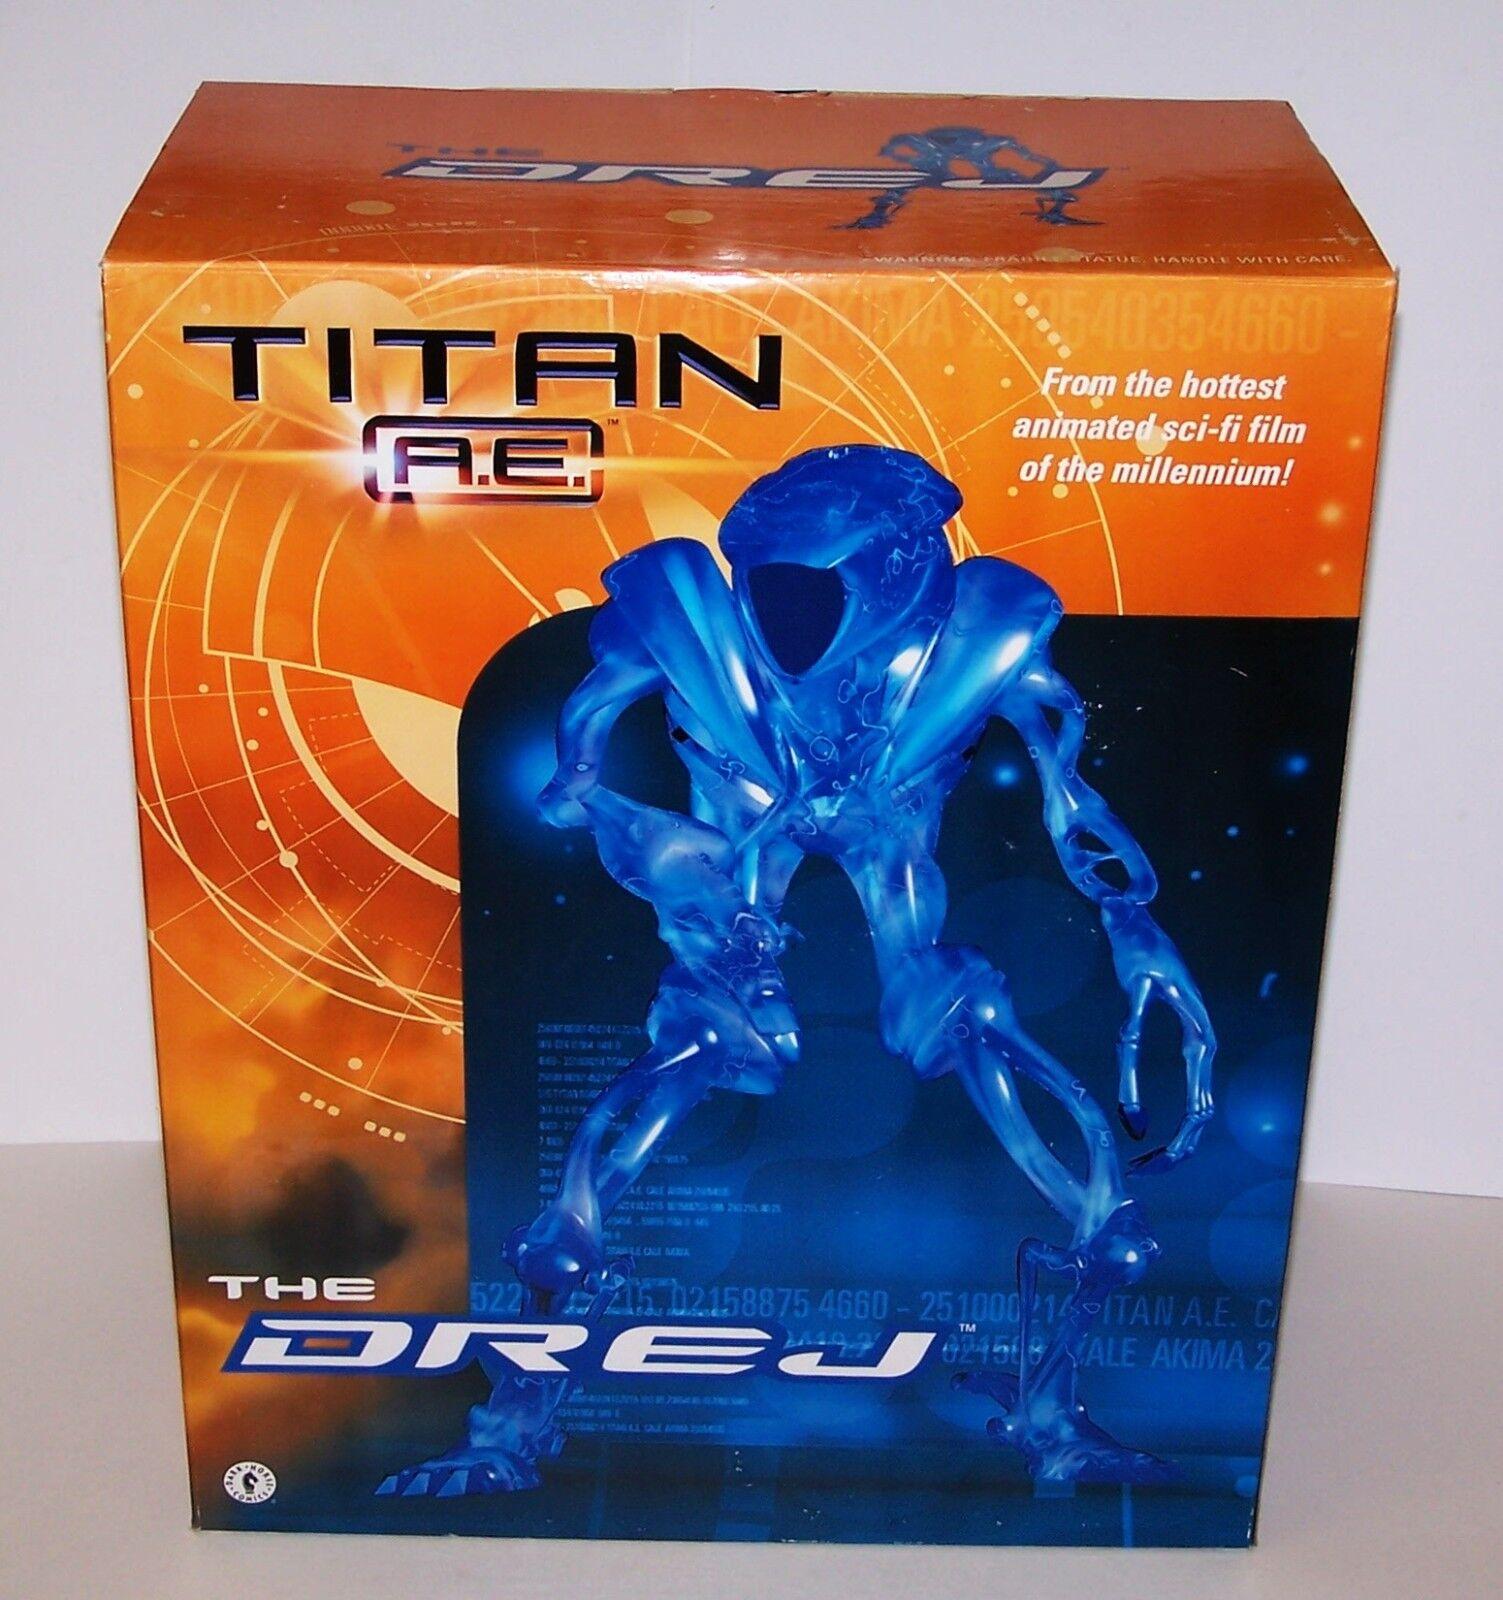 Titan A E The Drej 12  Statue  2000 NIB Sealed Hottest Sci-Fi Film Ever